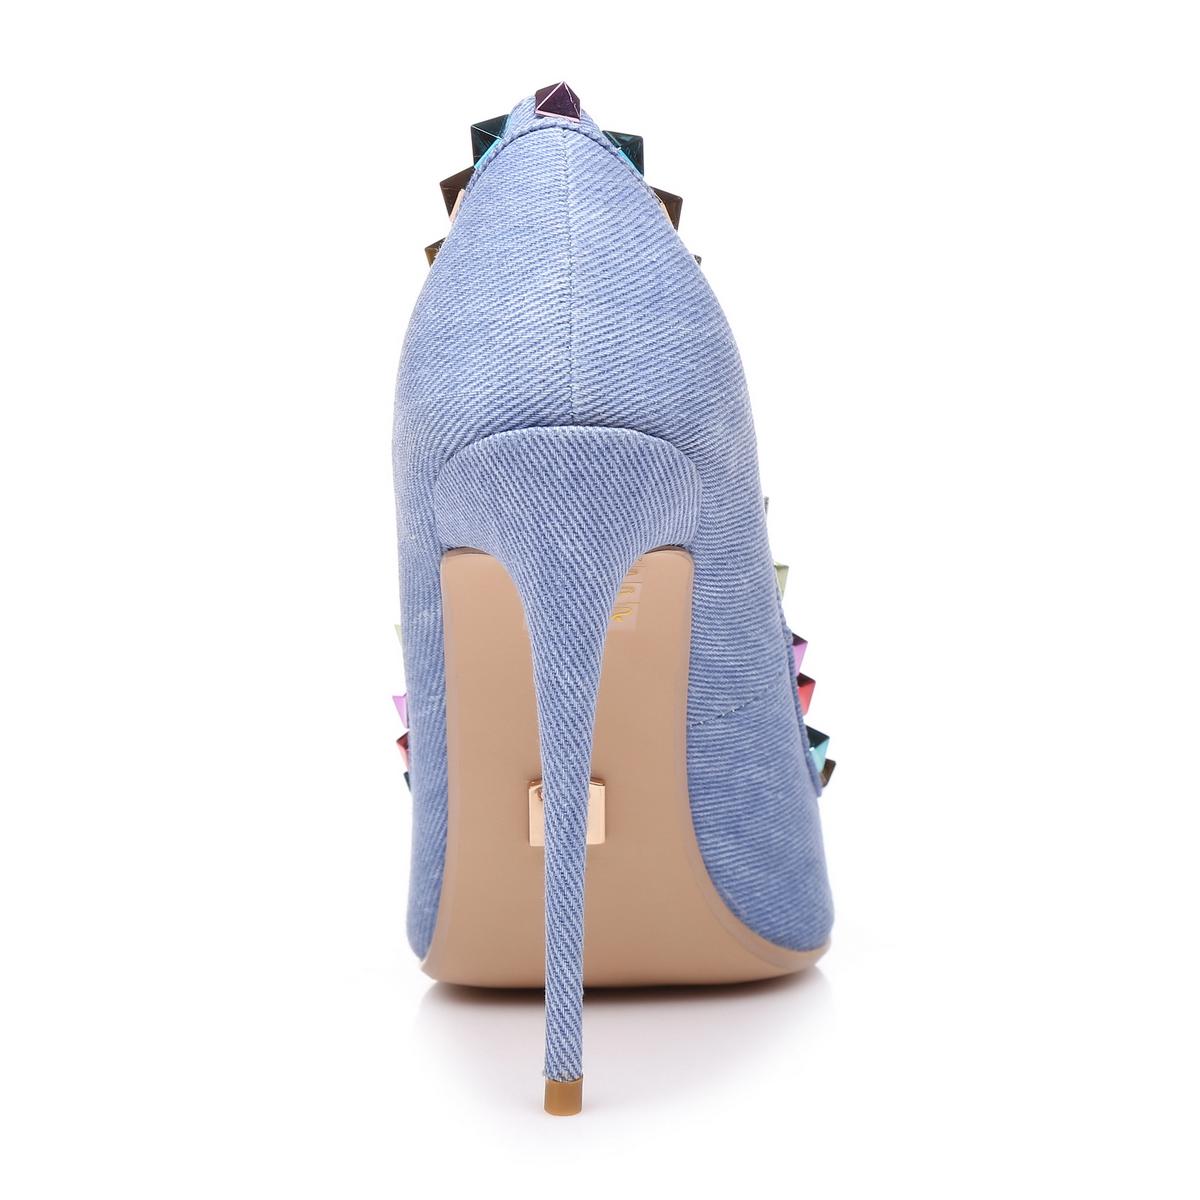 GIARO - Damen High Heels - Blau Schuhe in Übergrößen – Bild 3